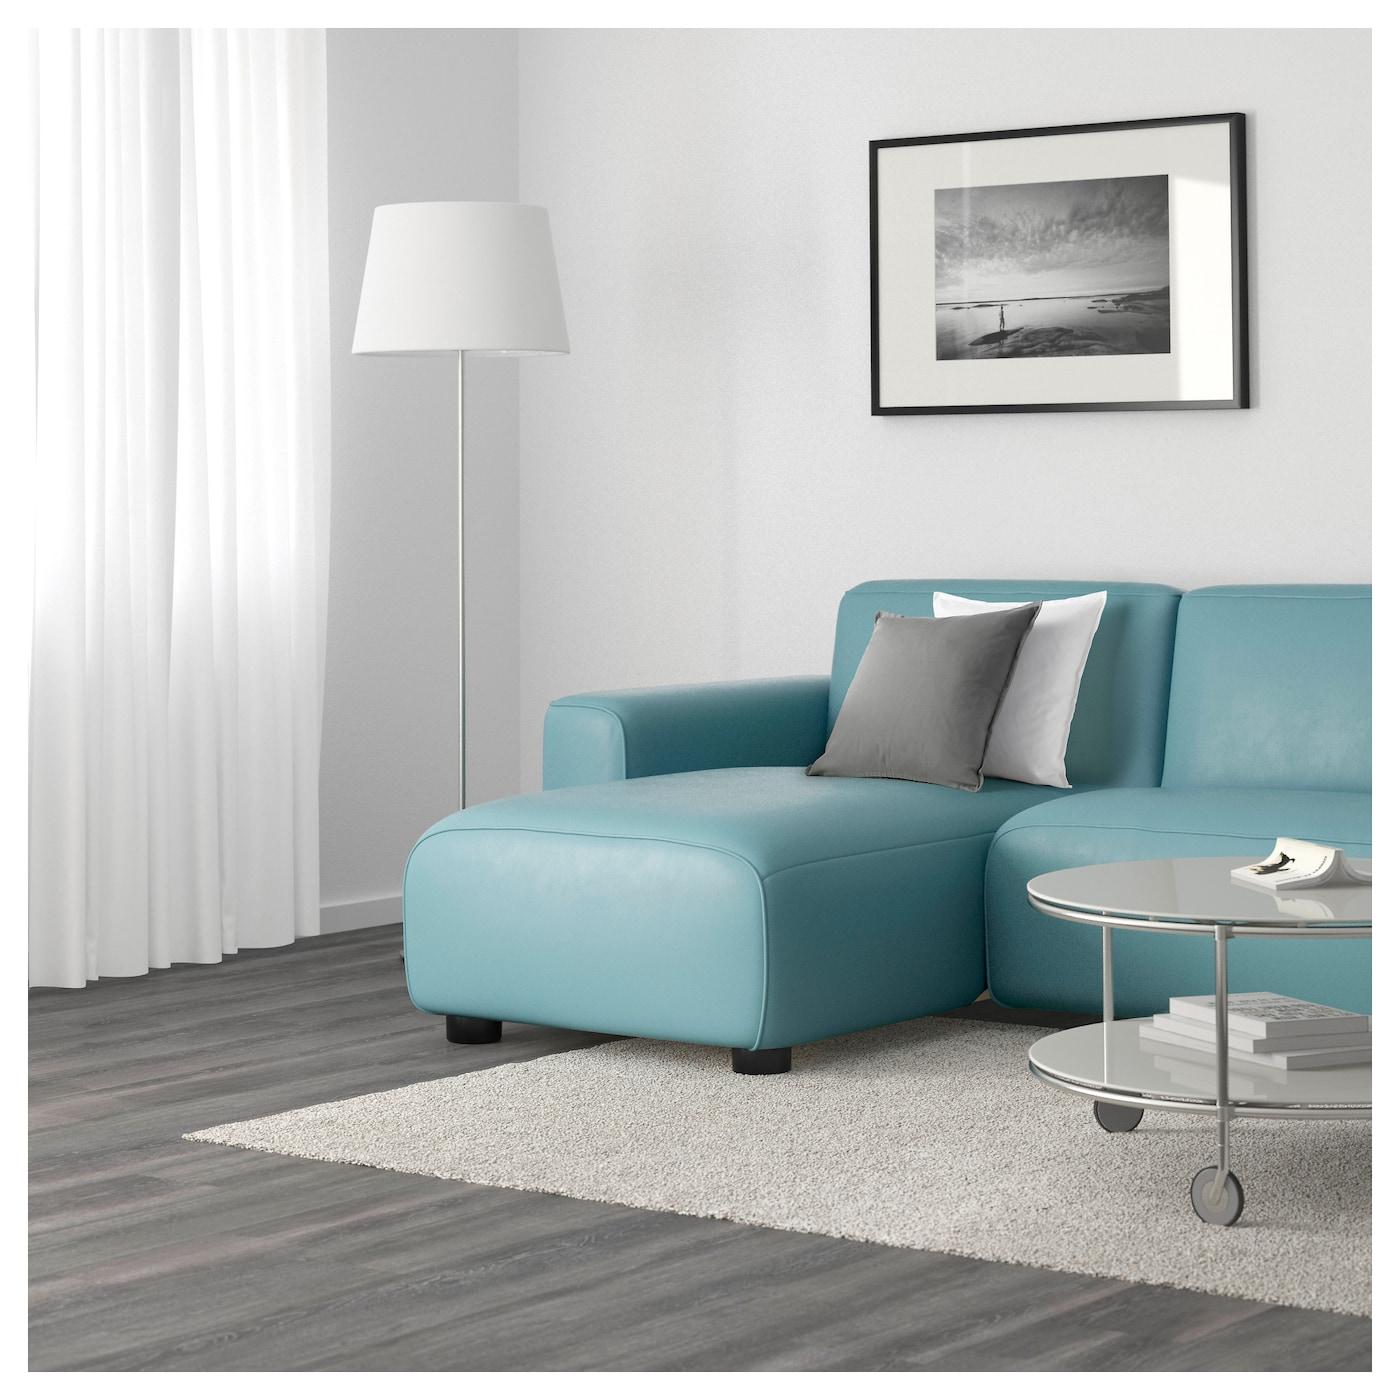 Dagarn two seat sofa with chaise longue kimstad turquoise for Chaise longue bleu turquoise